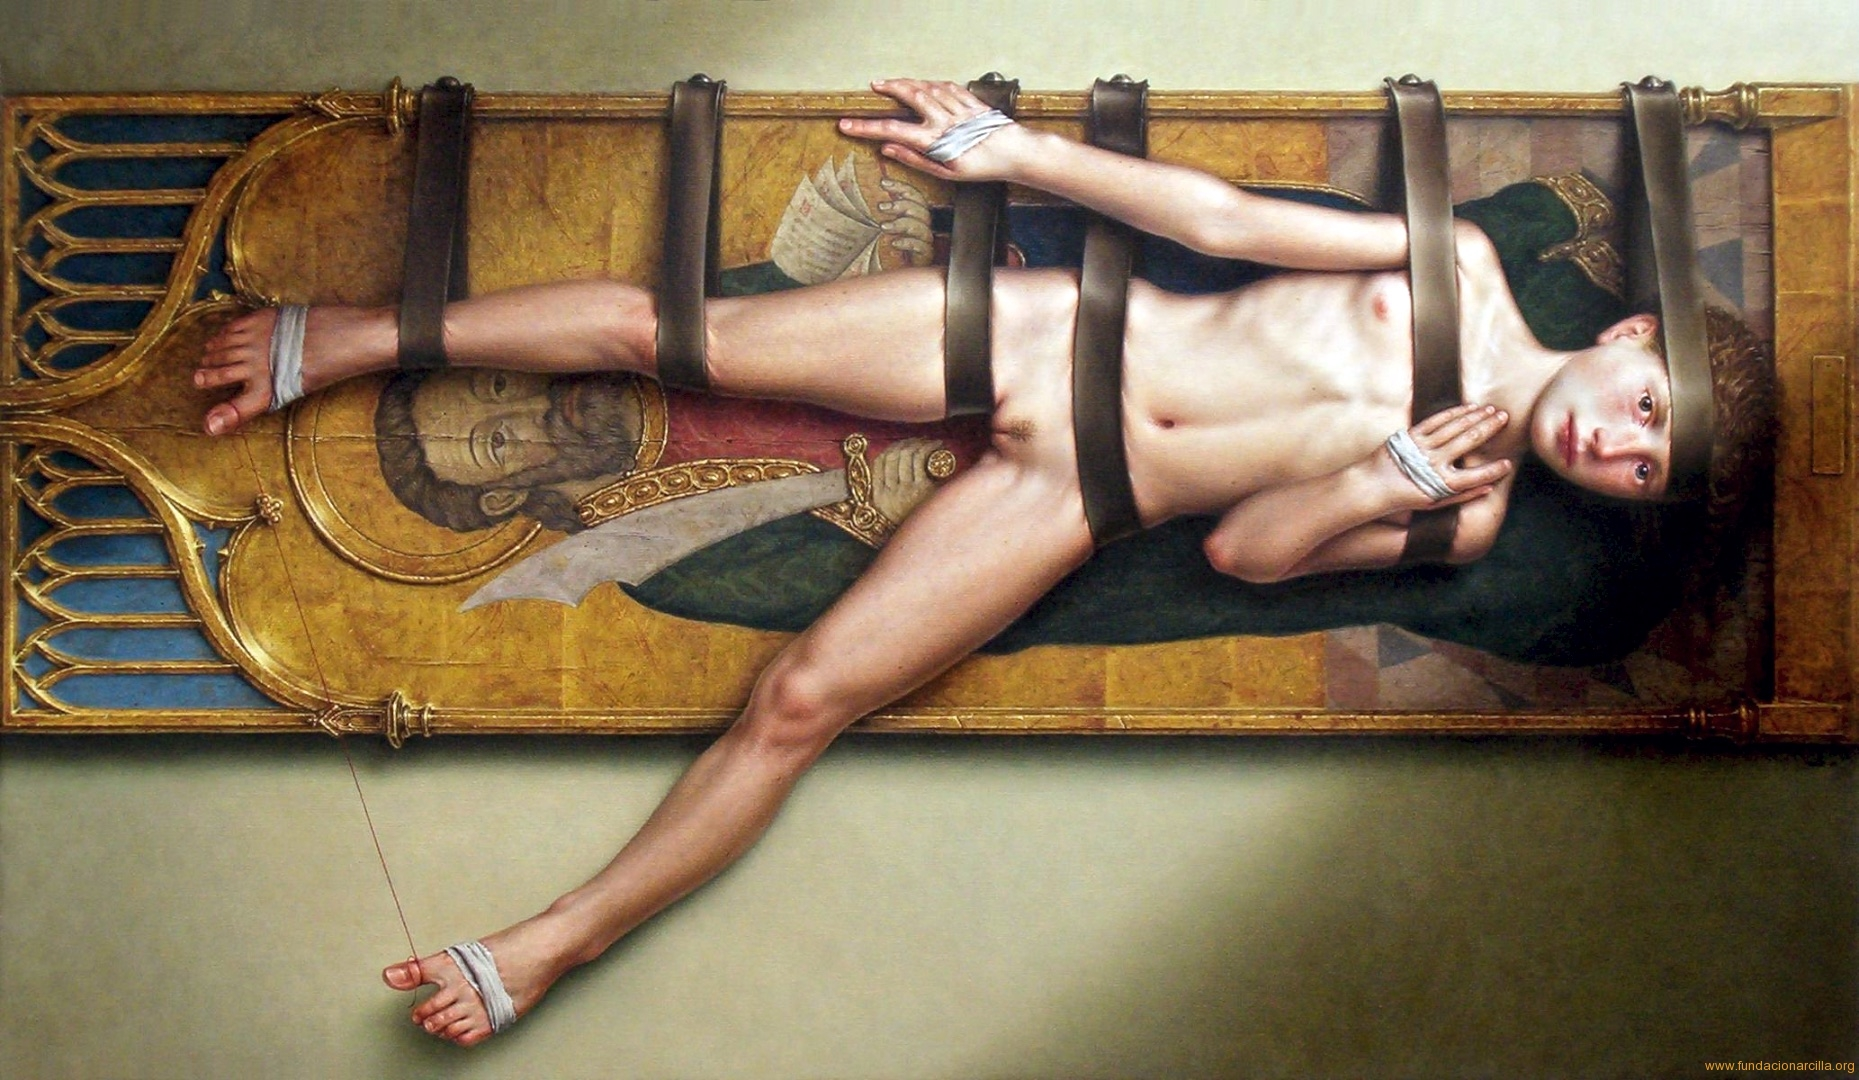 Dino Valls, Spain 'Haitus' 27.5X47in/70X120cm Oil on Canvas 2003